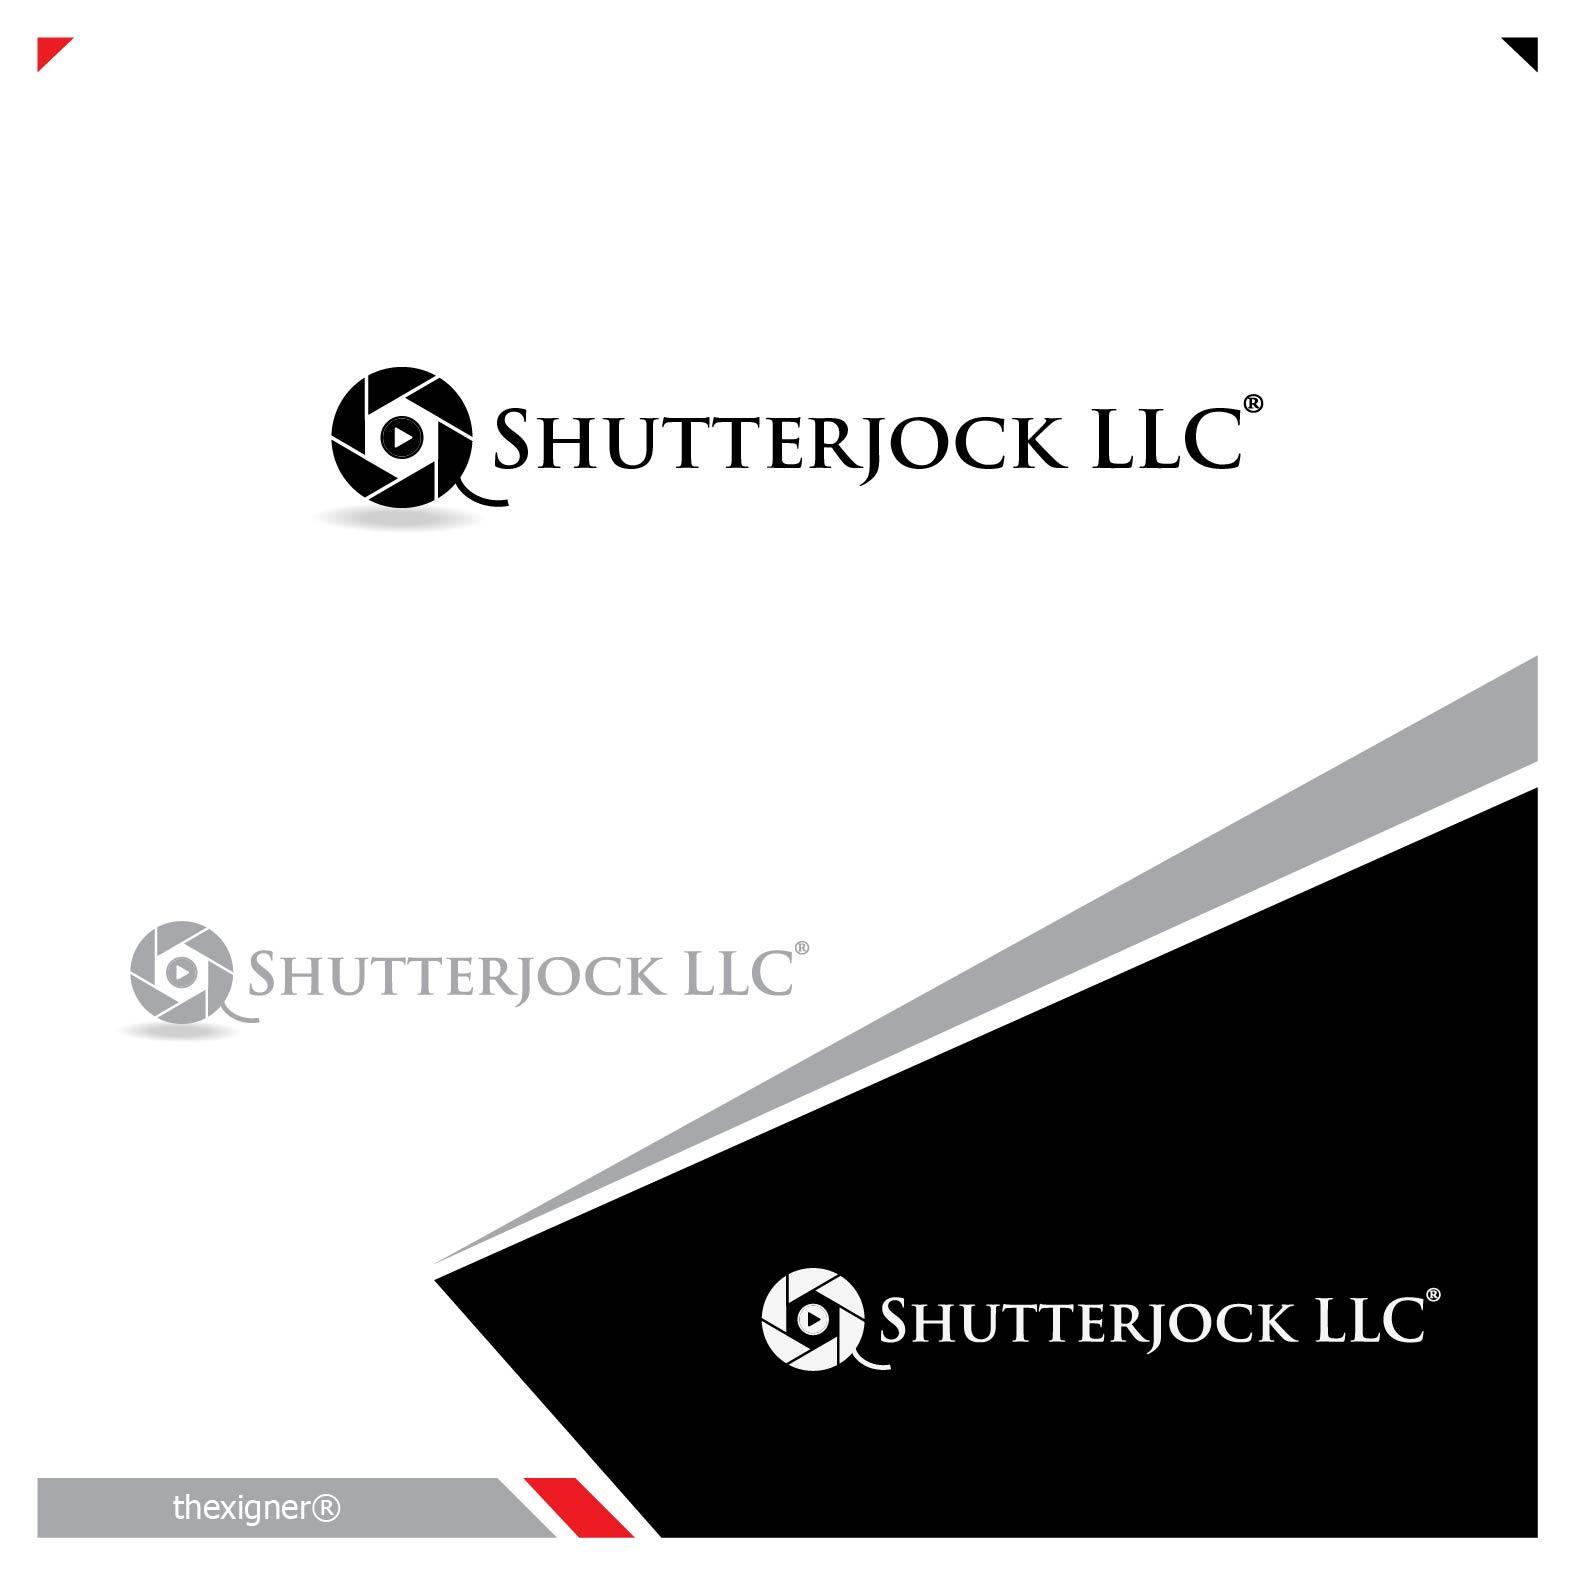 Logo Design by lagalag - Entry No. 32 in the Logo Design Contest Unique Logo Design Wanted for Shutterjock LLC.